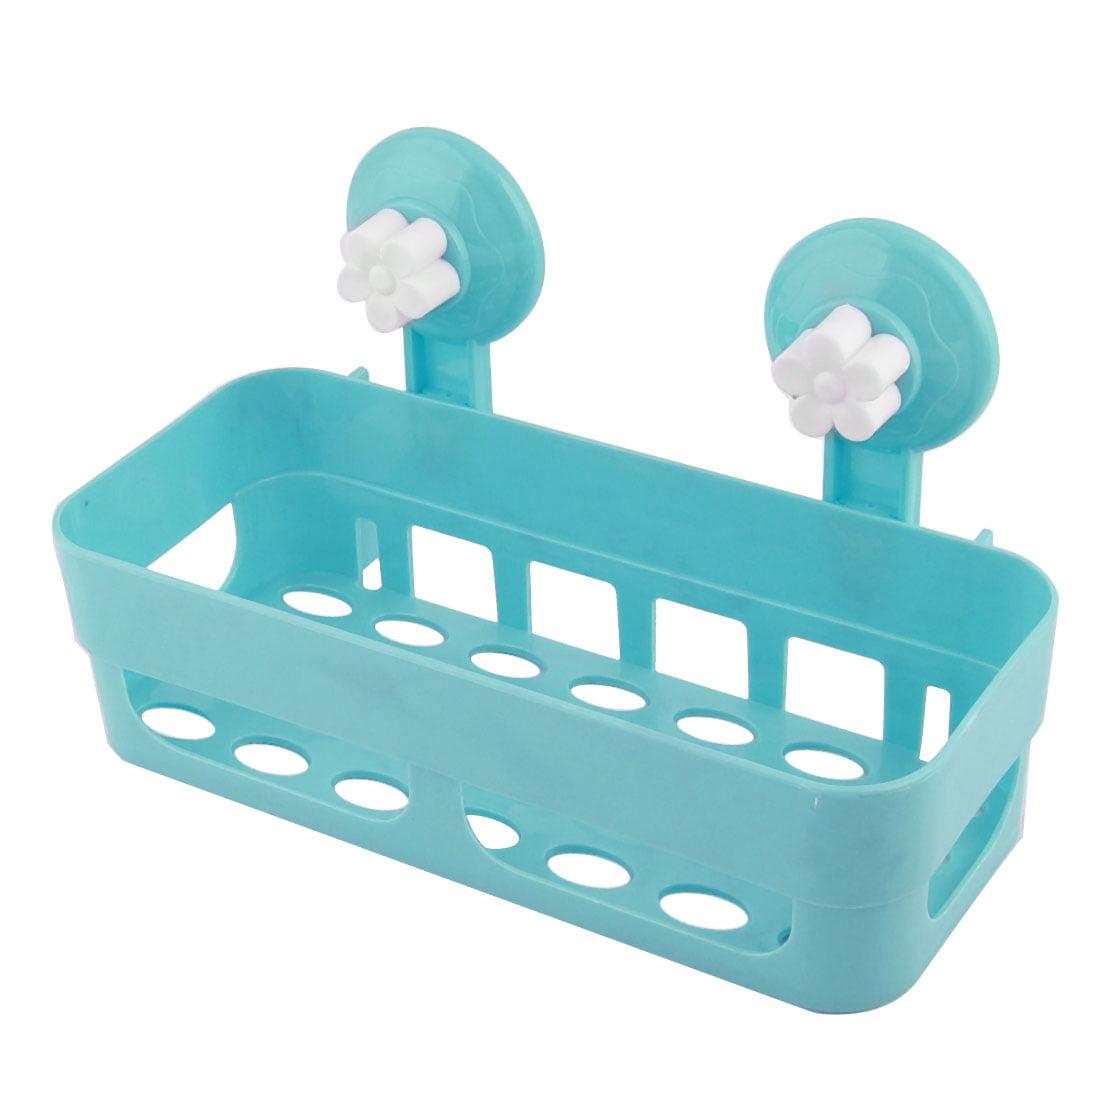 Bathroom Rectangle Plastic Commodity Organize Suction Cup Shelf ...